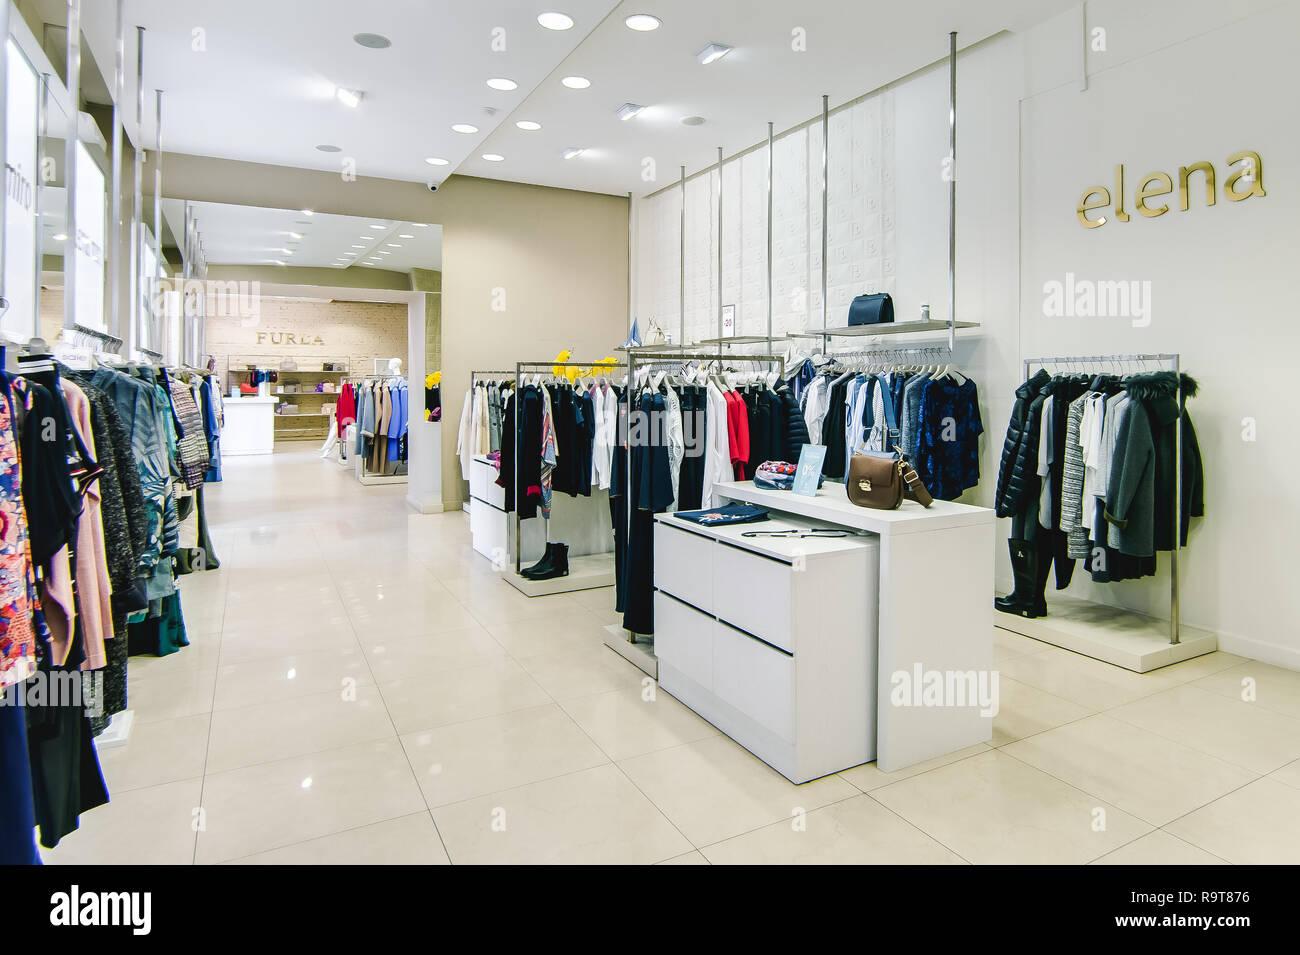 270e3af763c5 Russia, Novosibirsk - April 25, 2018: interior of women's clothing and  accessories store boutique EMPORIO